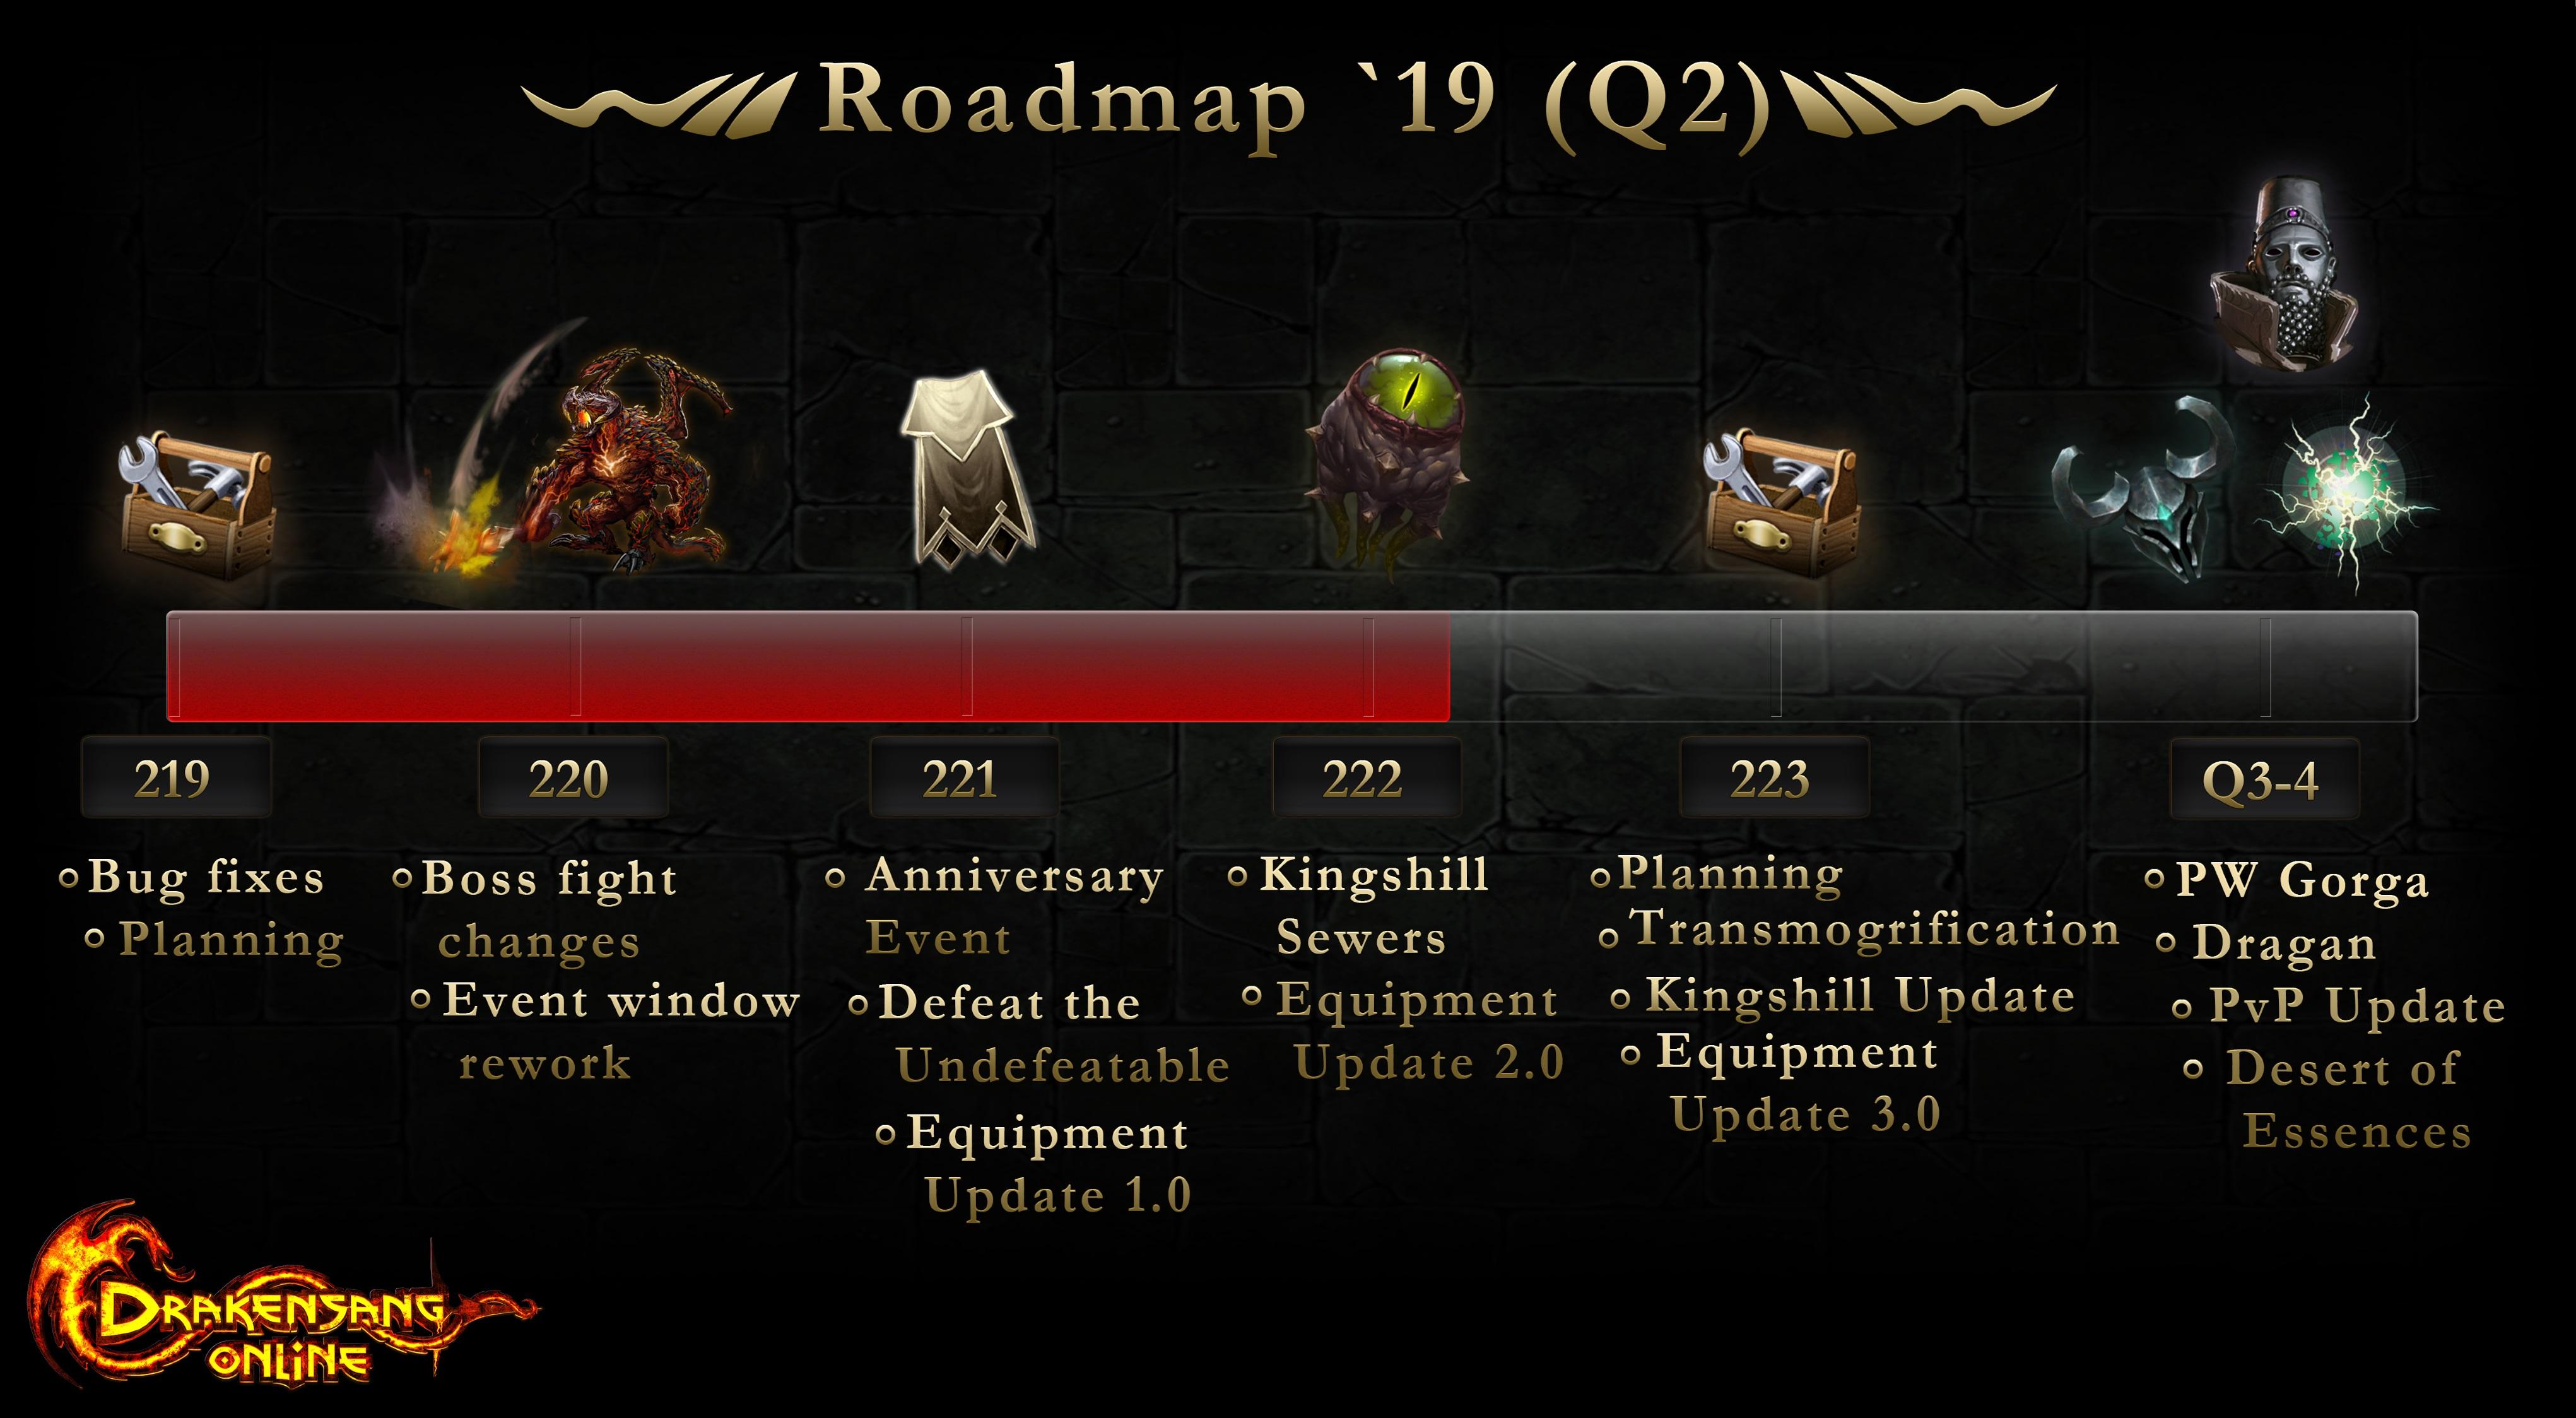 roadmap 2019 q2.jpg